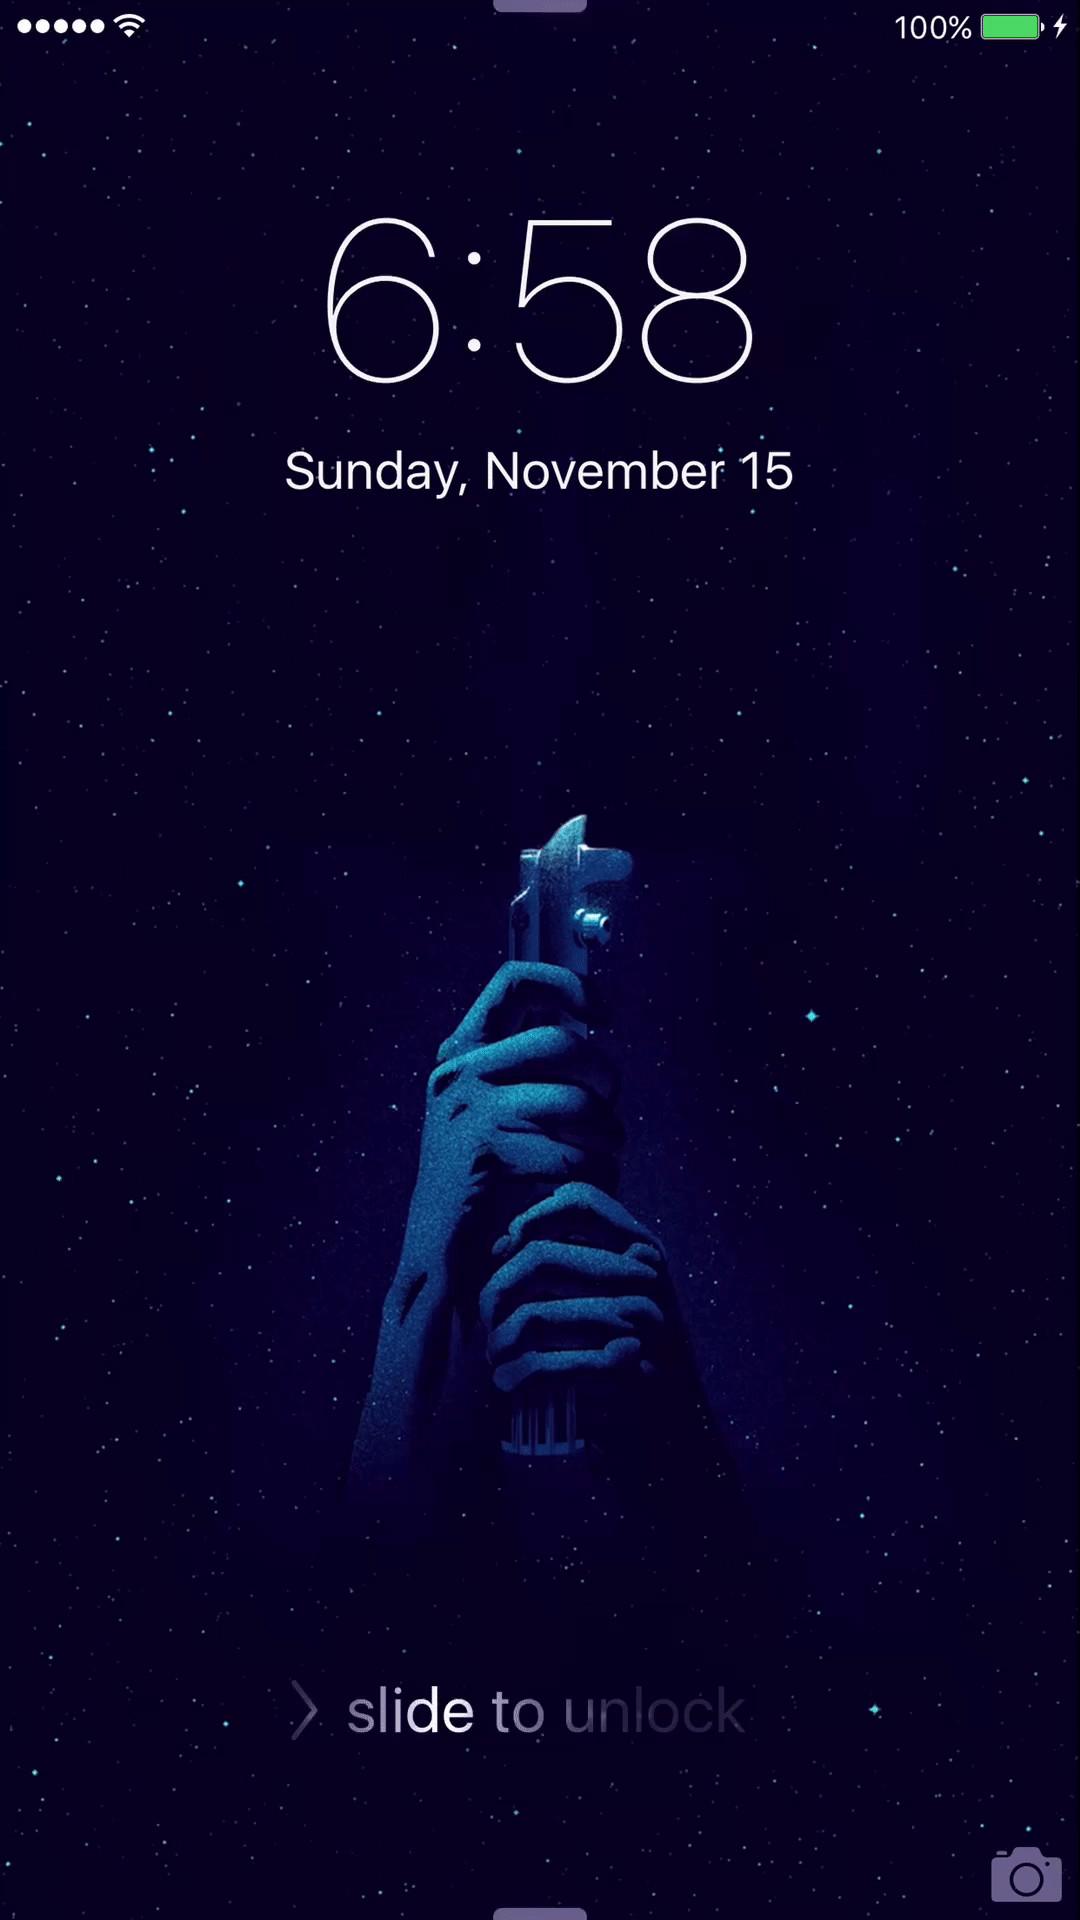 star wars live iphone wallpaper custom